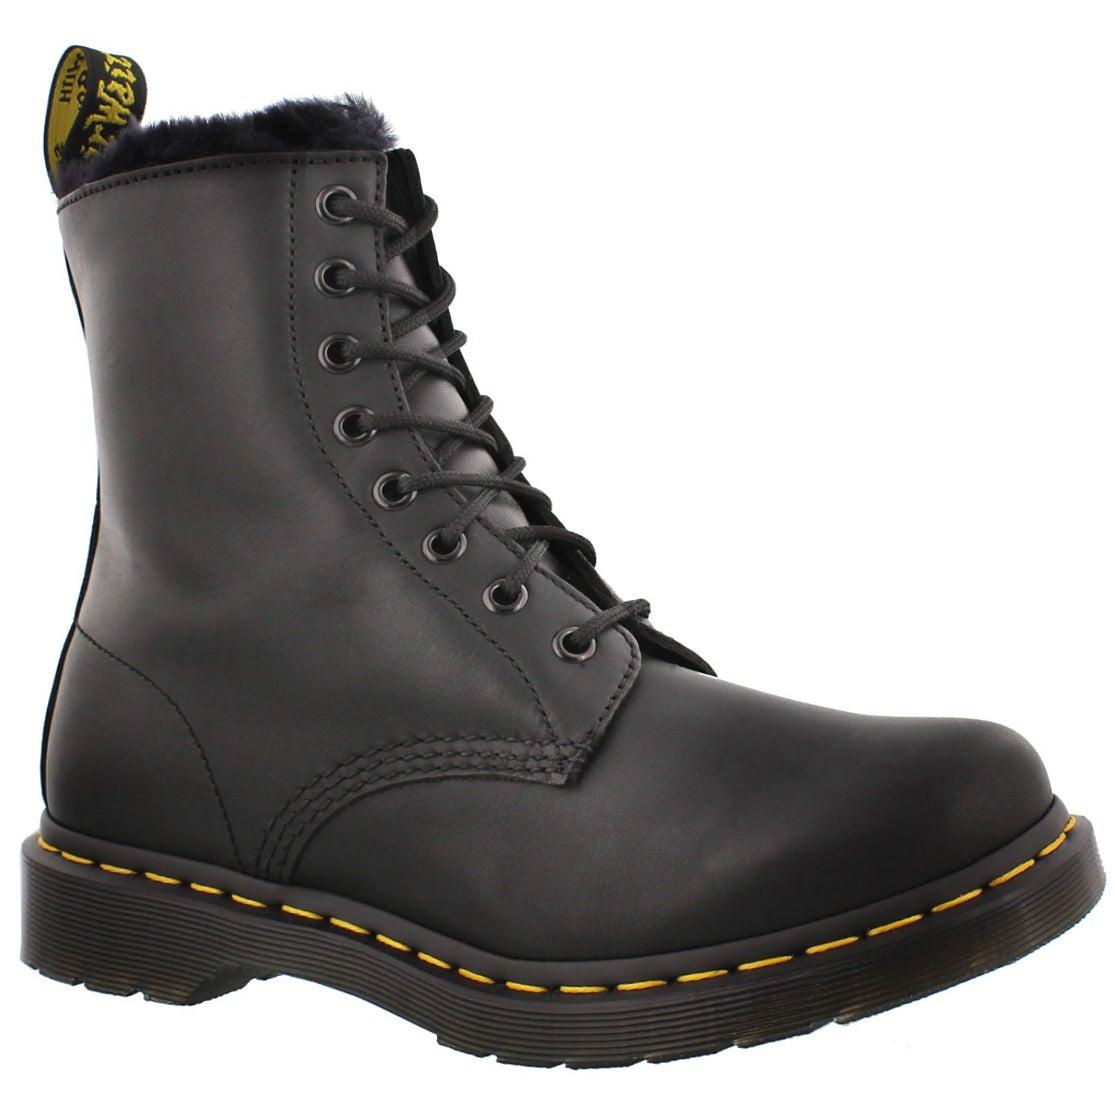 Women's SERENA 8-Eye black faux fur lined boots